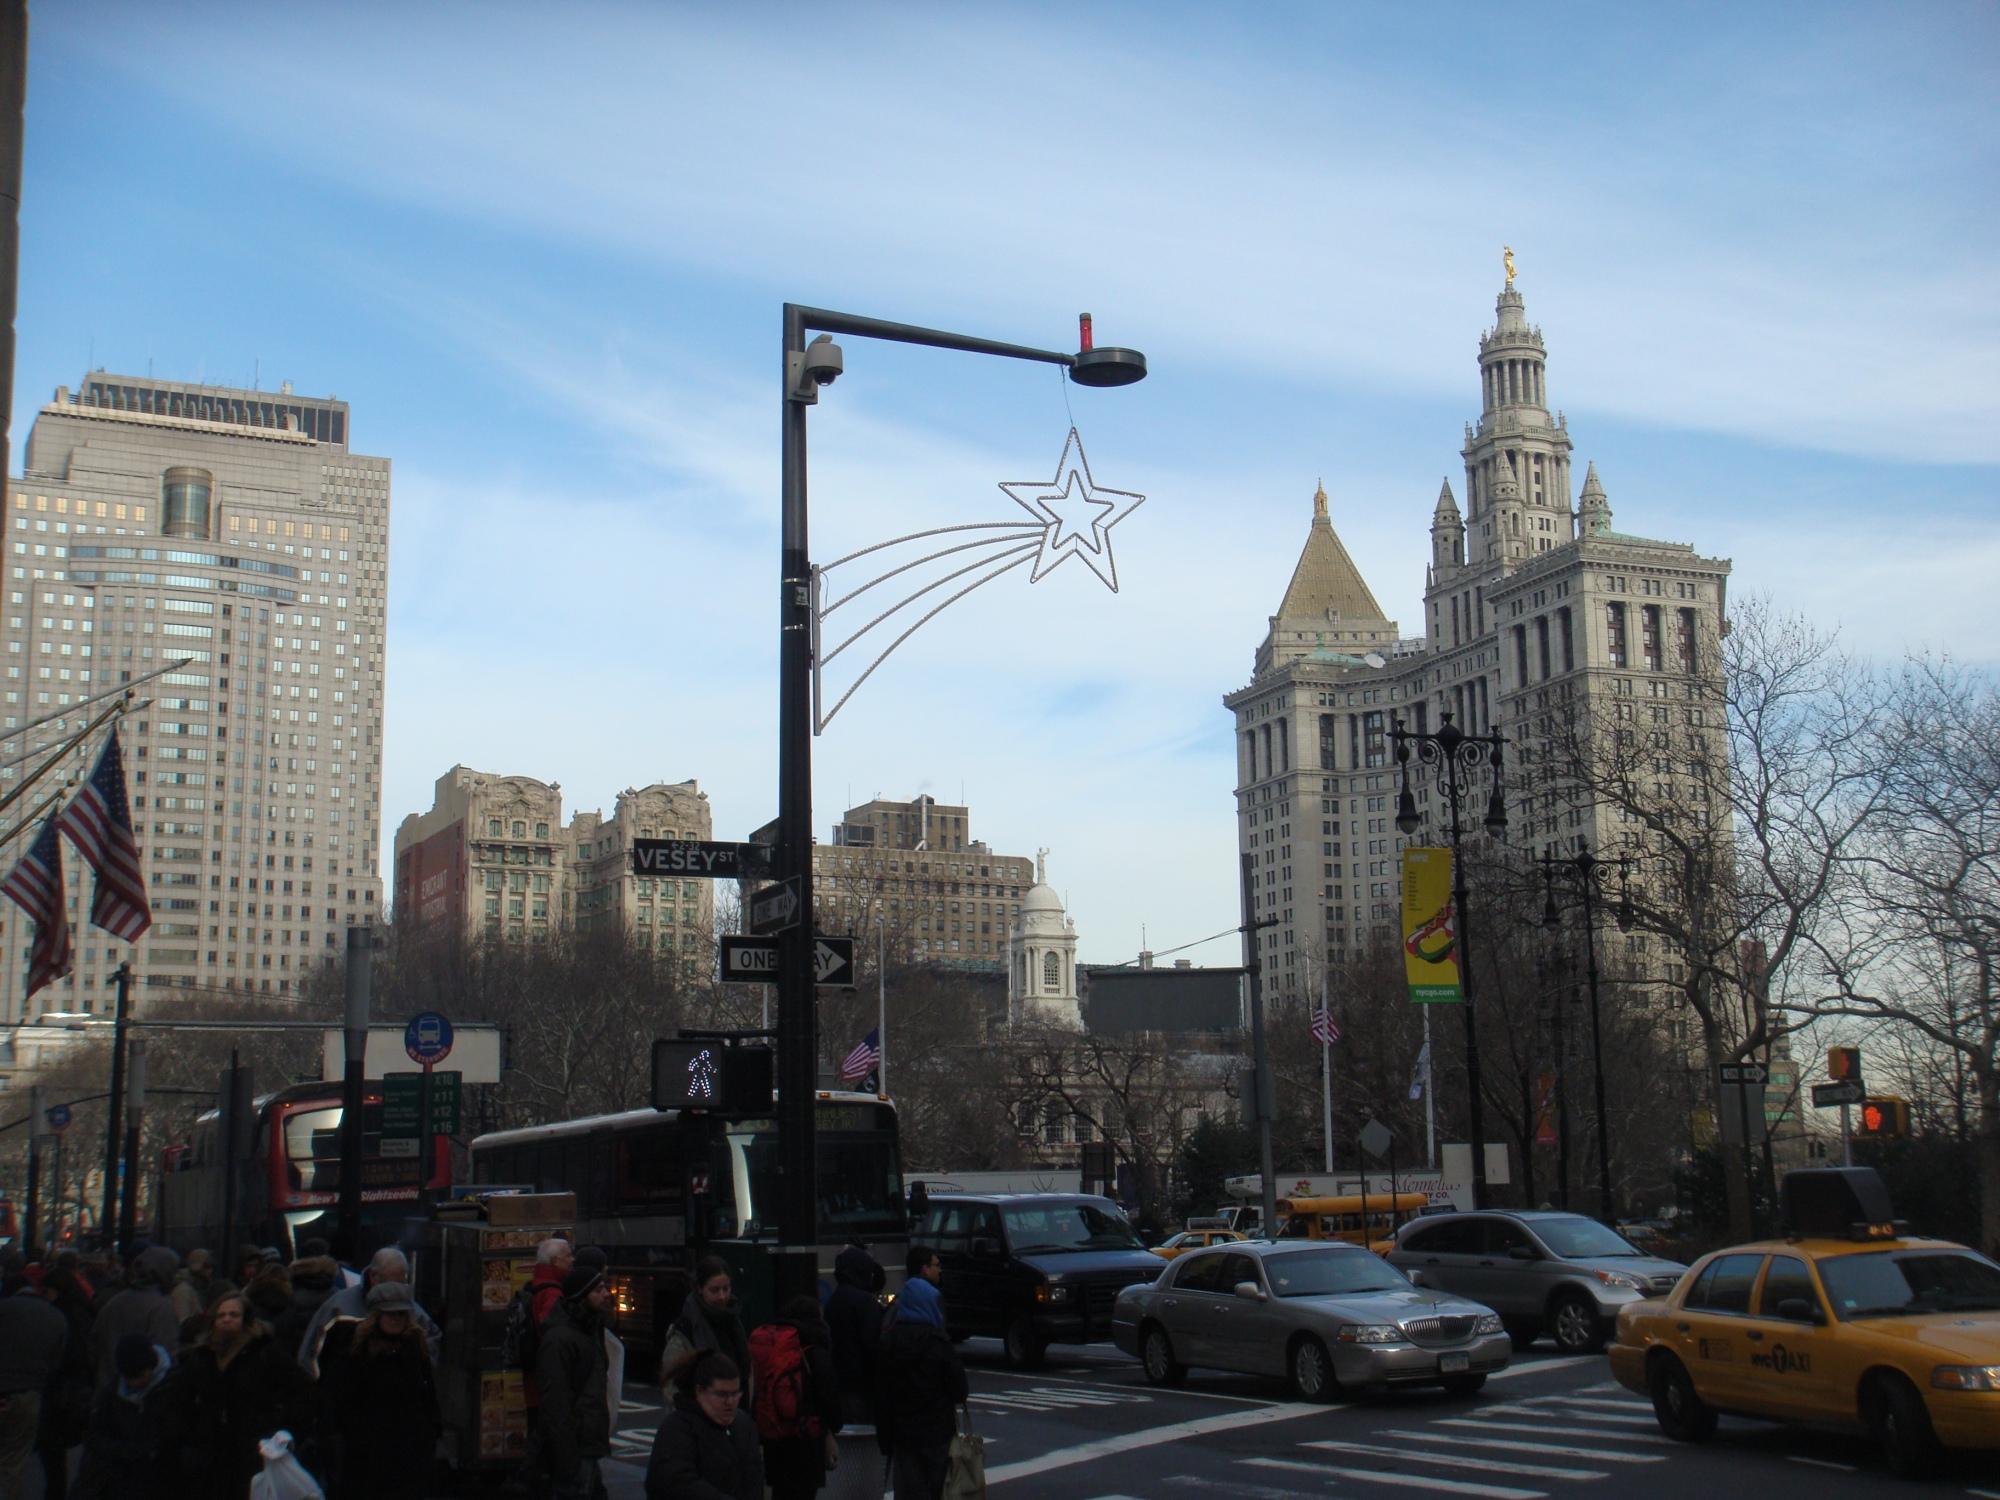 NYC city views